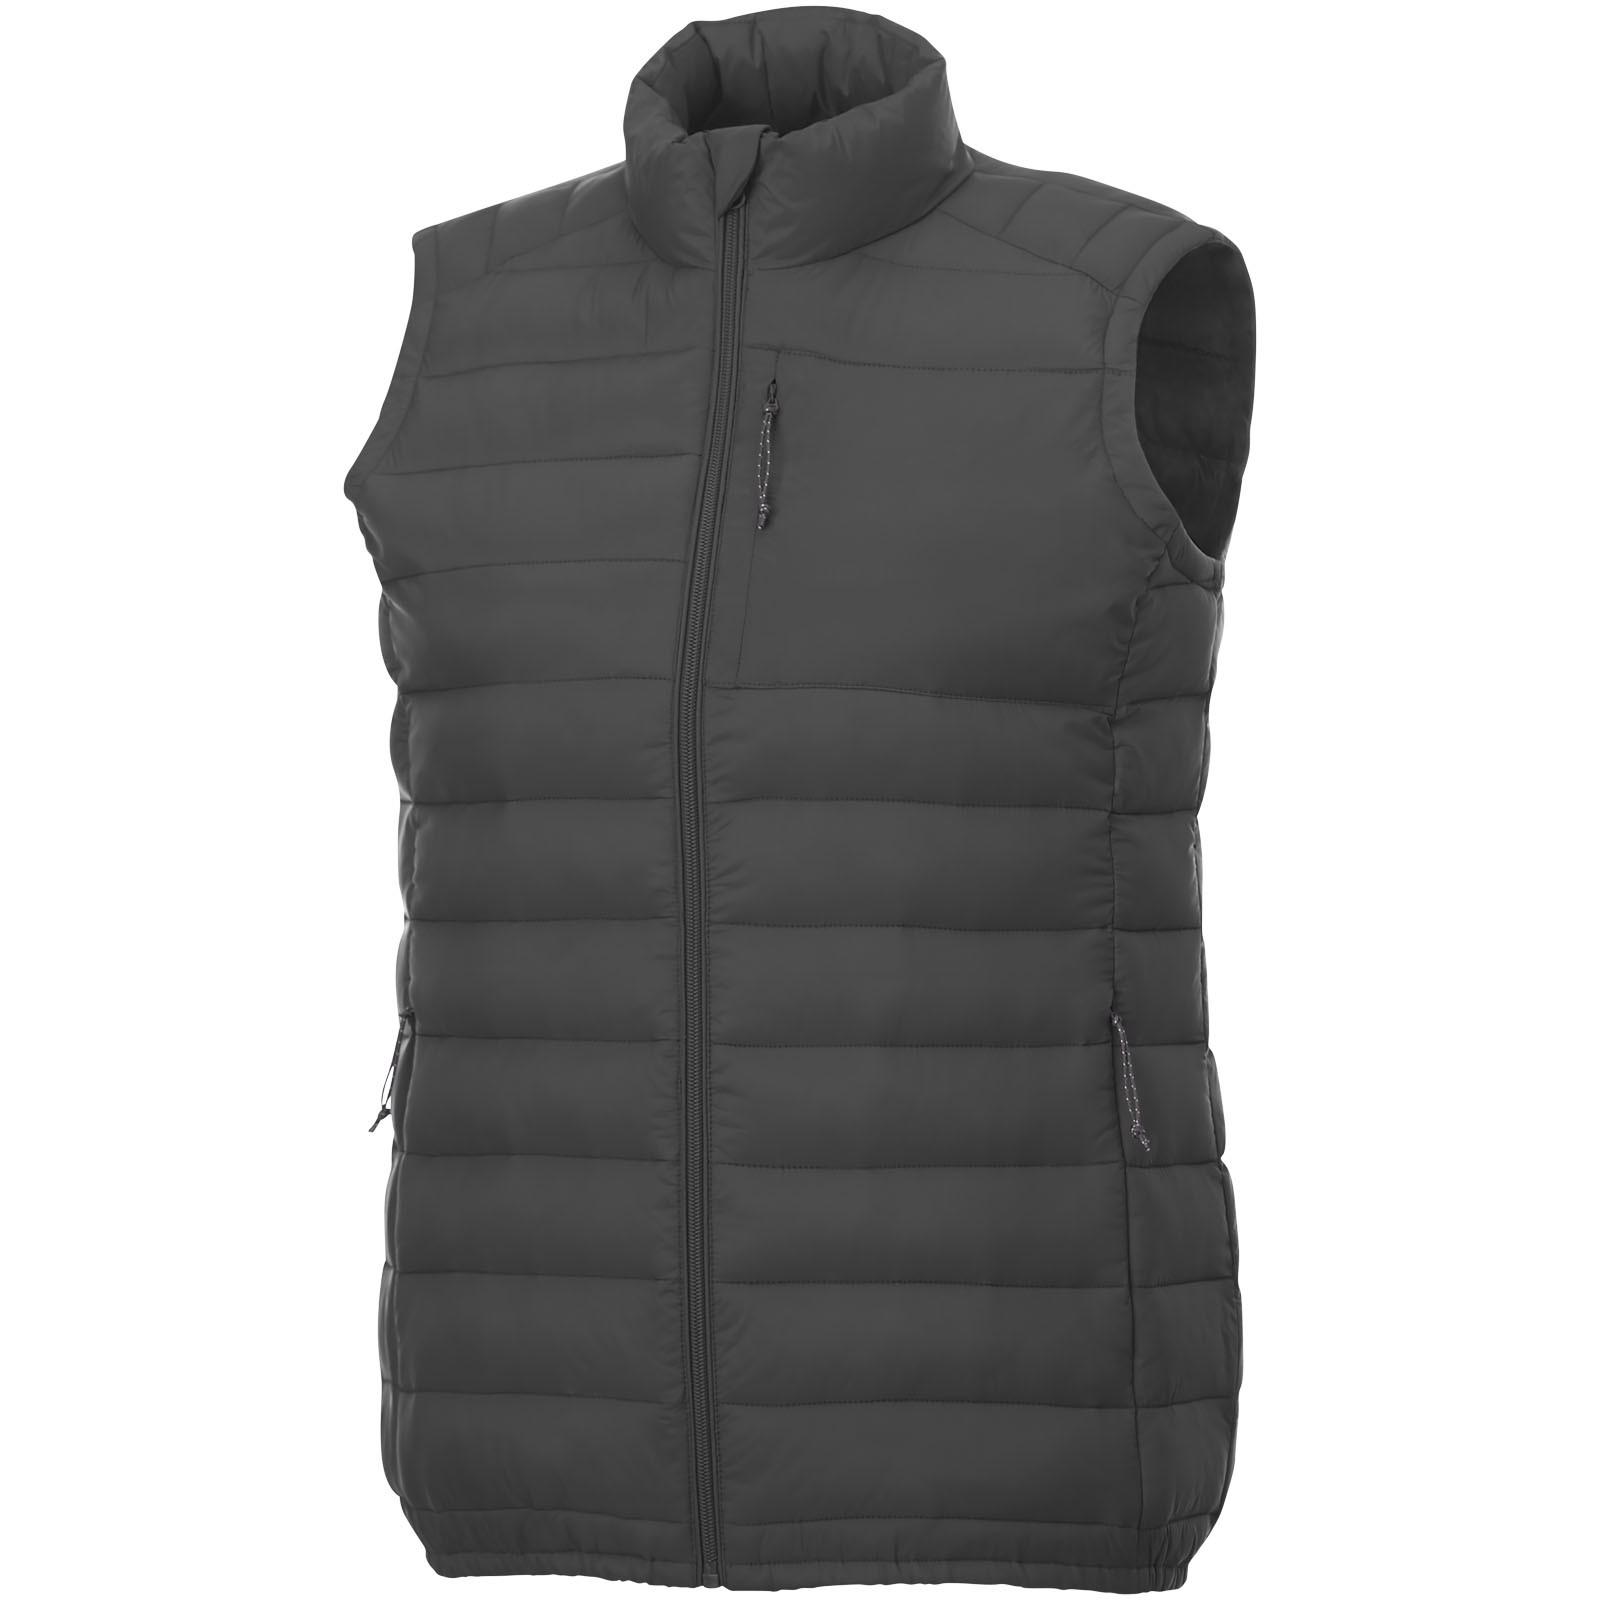 Pallas women's insulated bodywarmer - Storm Grey / XS